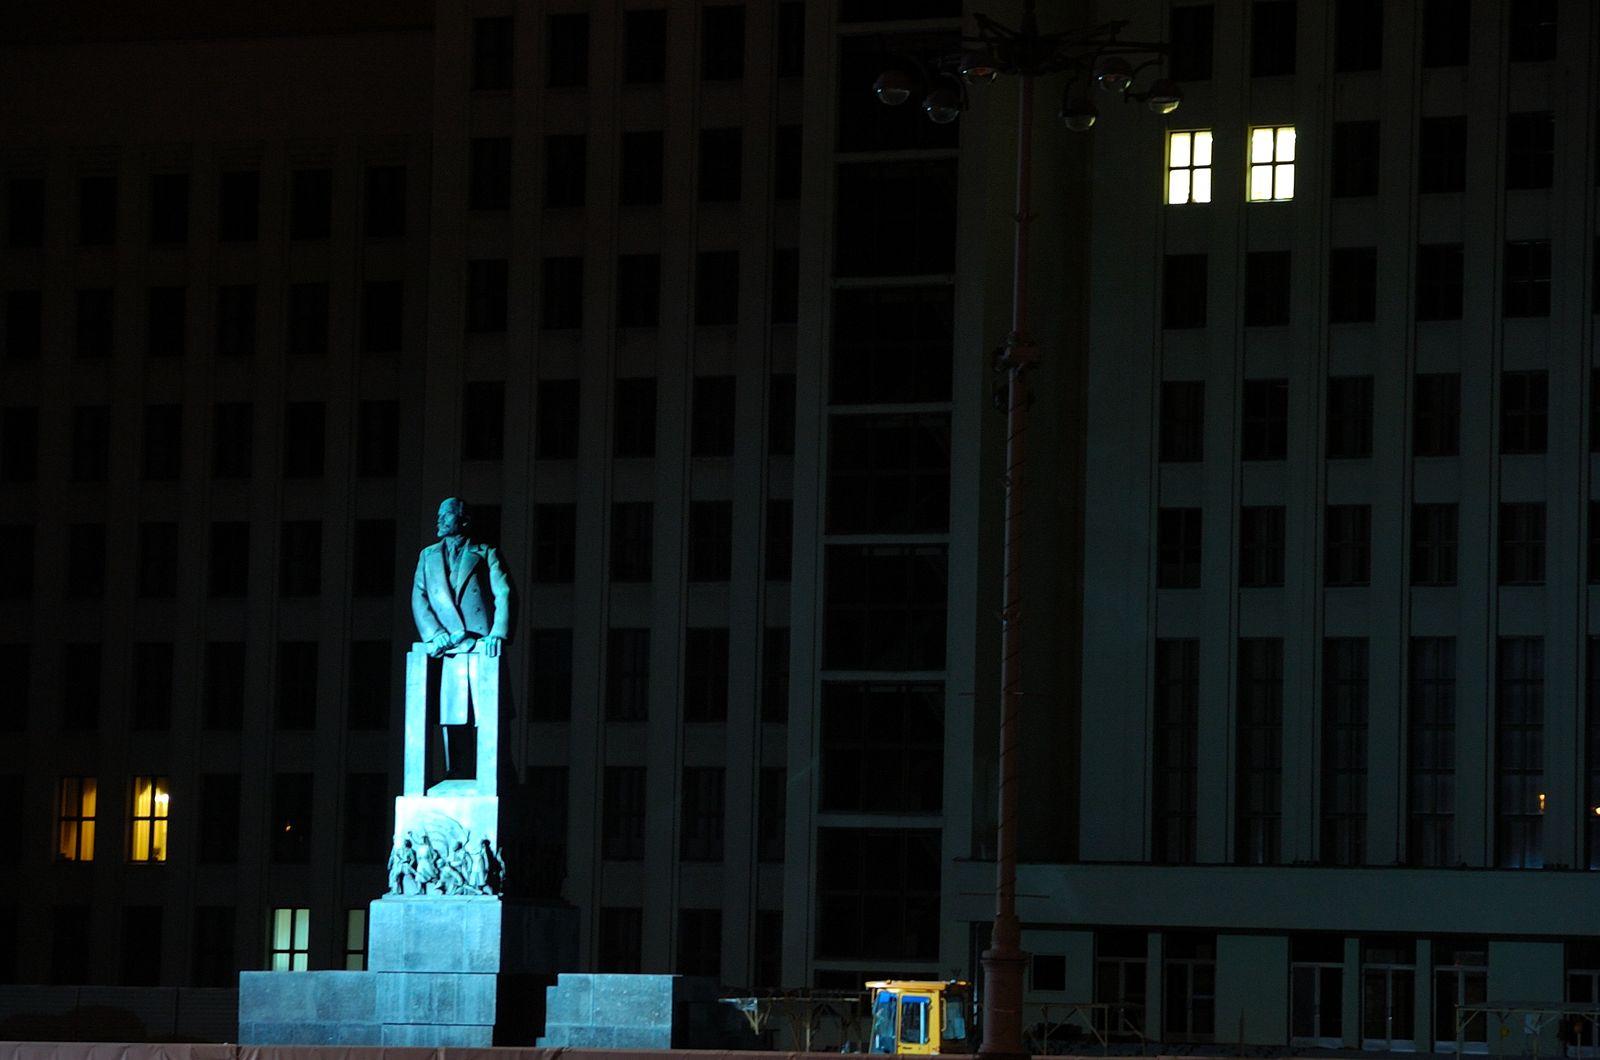 Yurij Antipitchev. Reality. Minsk, 2013